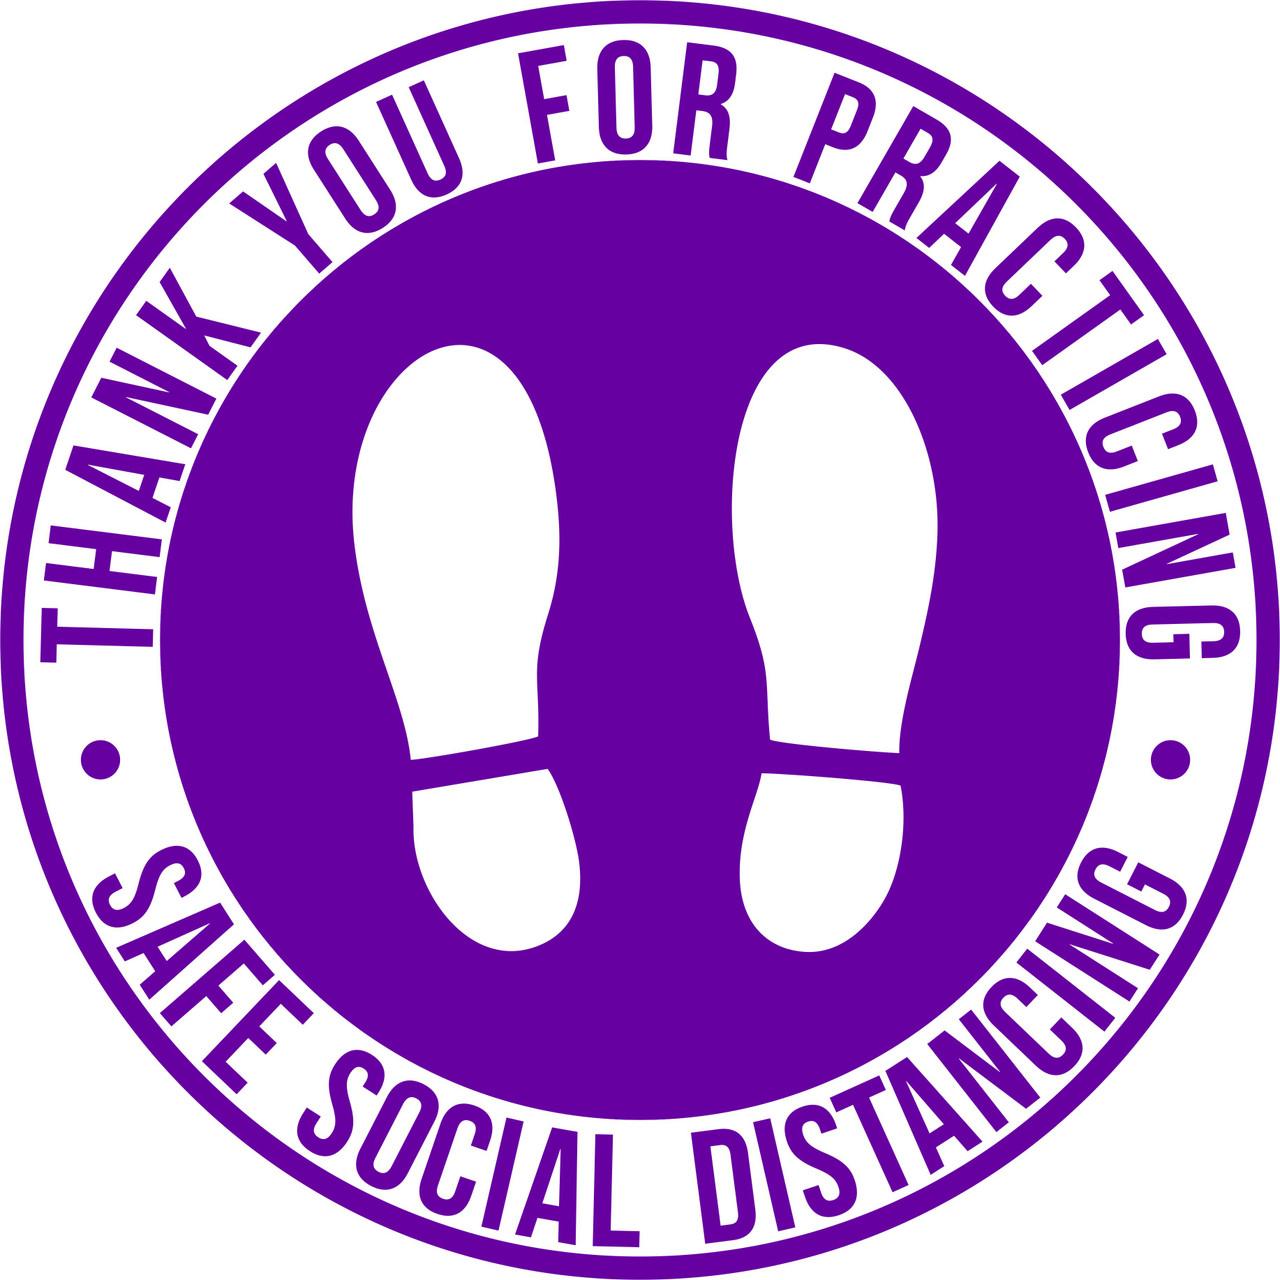 "Purple Social Distance Marker Floor Decal   12"" Round Social Distancing Floor Sticker   COVID-19 Floor Decal   Social Distancing Floor Graphics   Pandemic Floor Signs   Safe Social Distancing floor Signage"